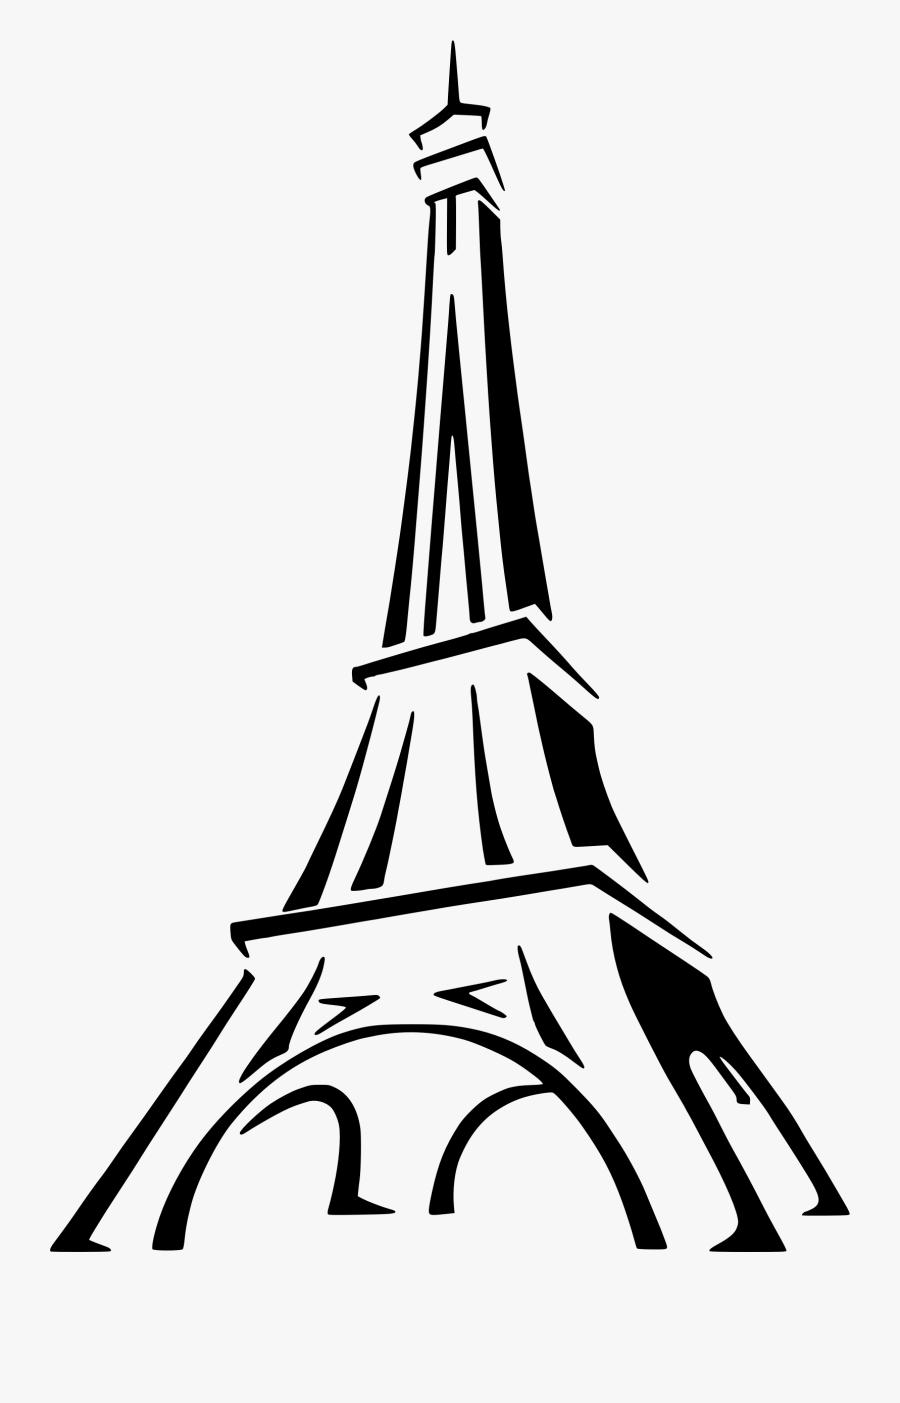 Clipart Eiffel Tower 2 Clipartandscrap - Eiffel Tower Logo Png, Transparent Clipart